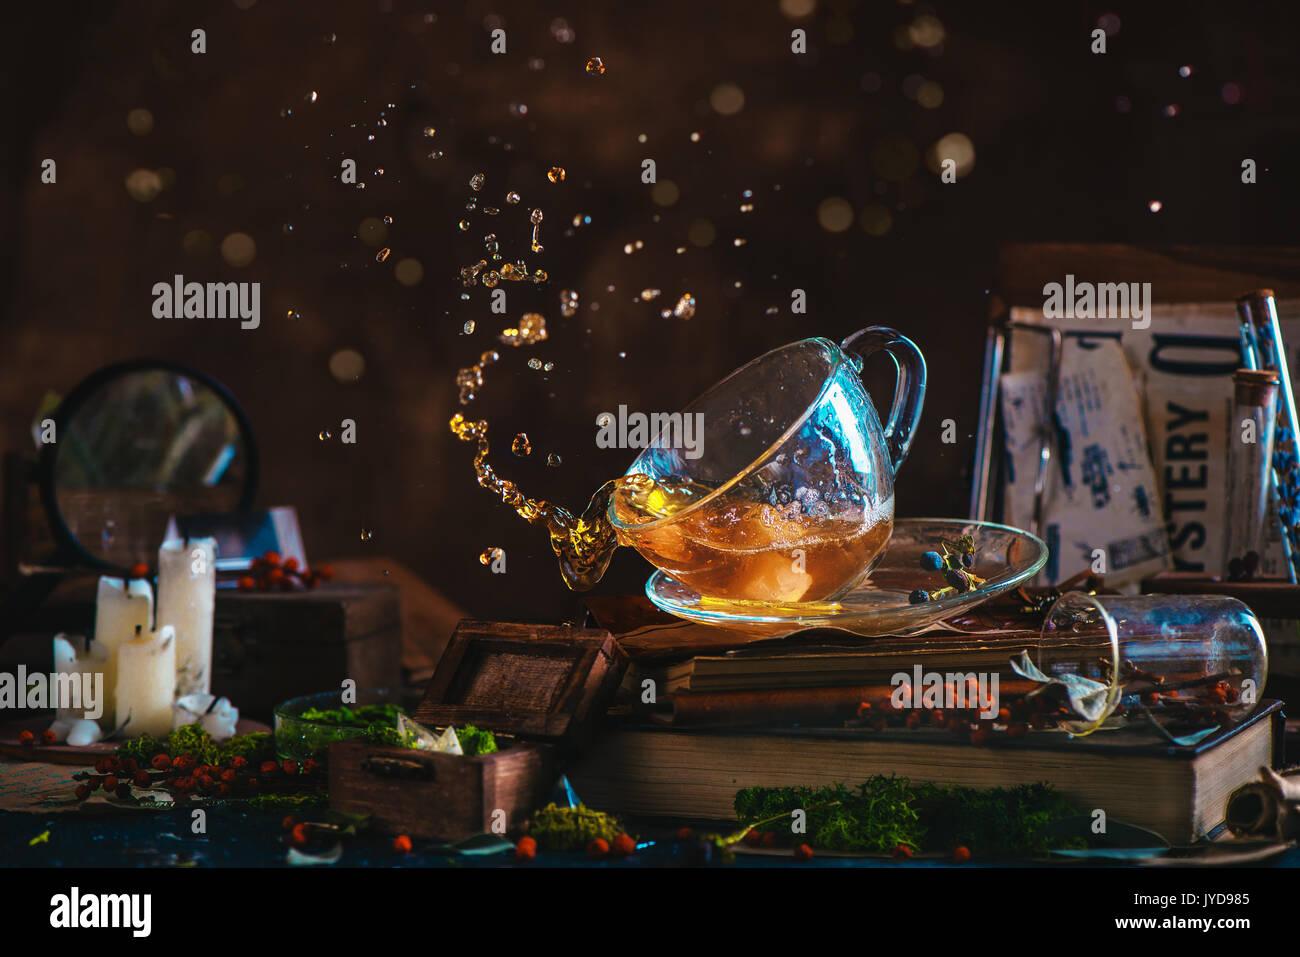 Splash de té en un vaso sobre un fondo de madera con velas, misterio periódico clips, libros, hojas y musgos. Acción bodegón con gotas de té bokeh Imagen De Stock